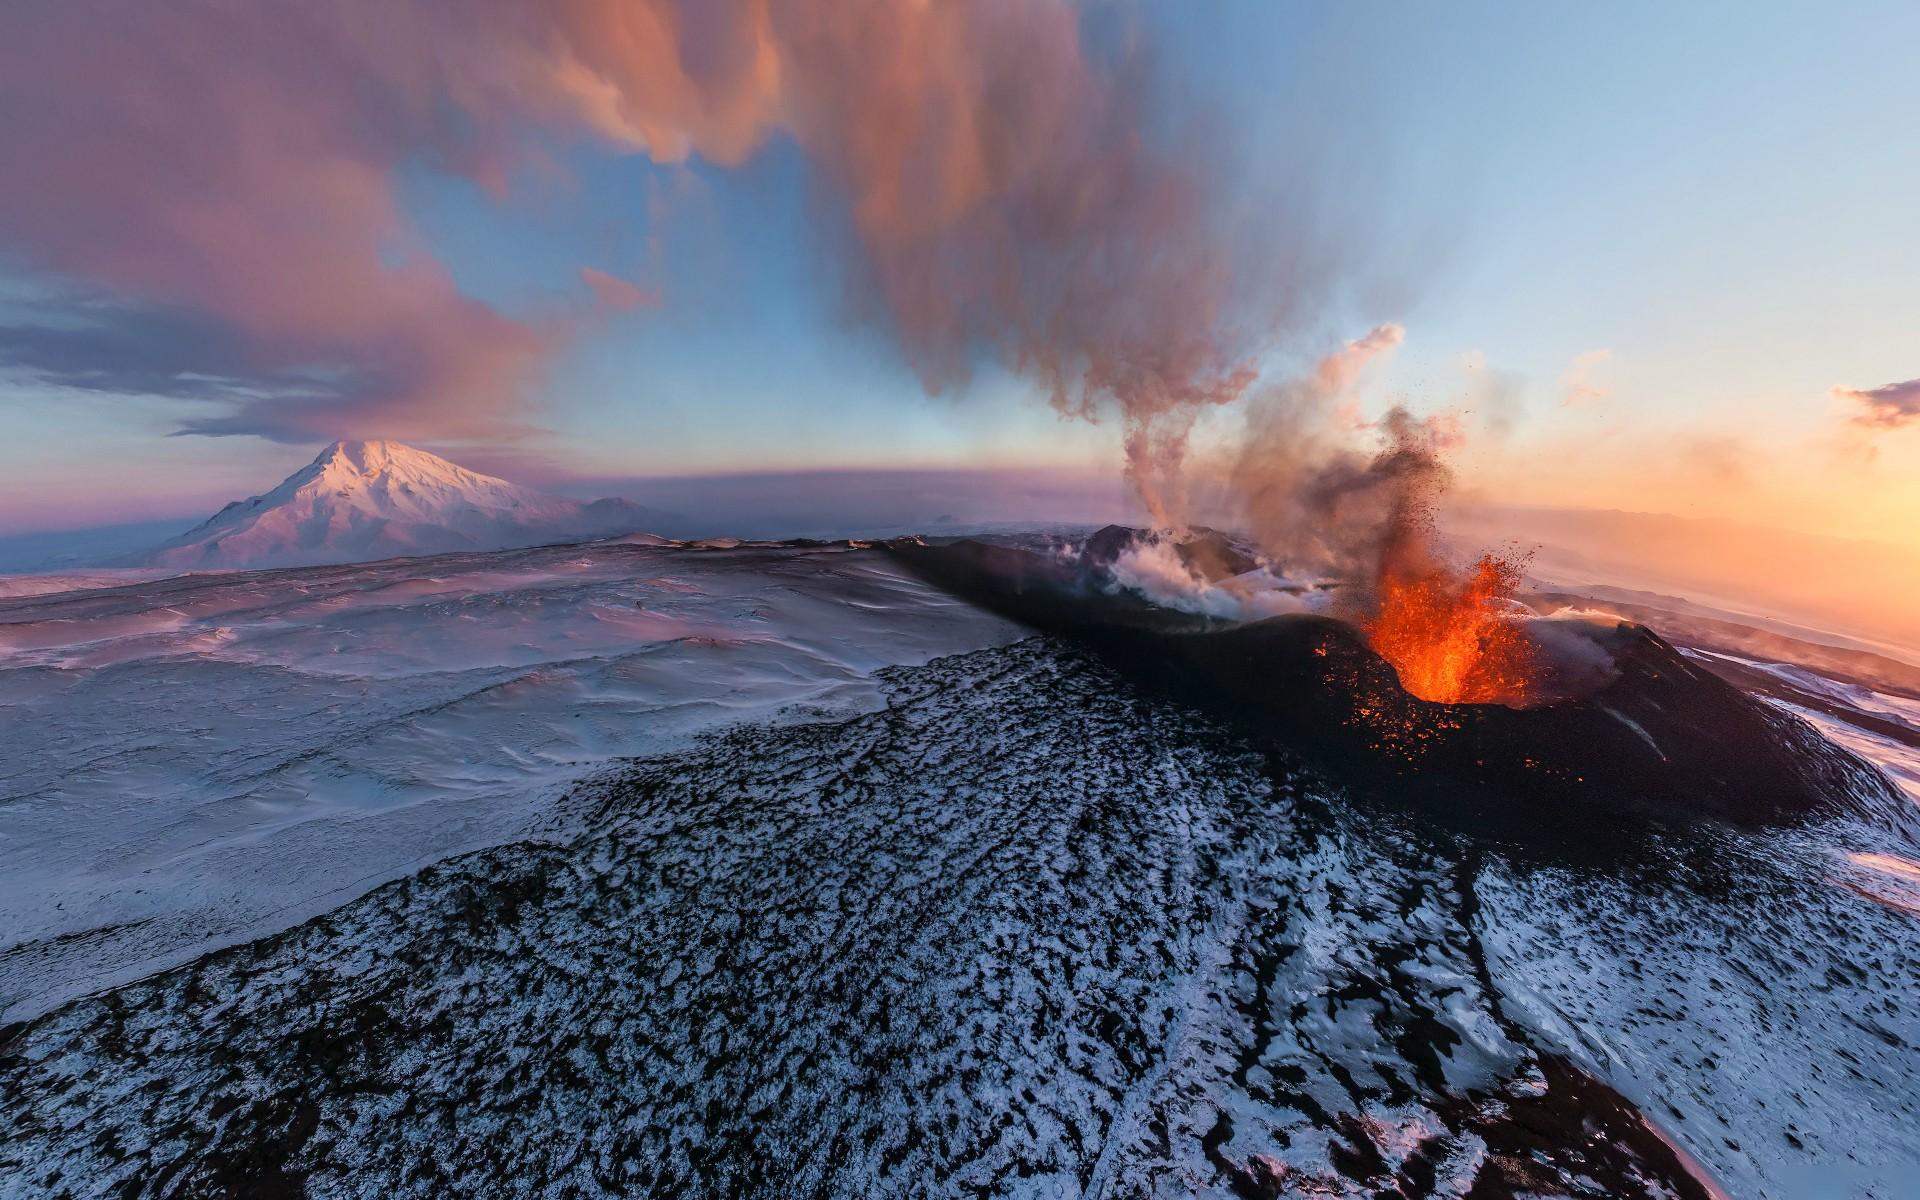 Volcano Wallpapers 1080p 5HLFG62   4USkY 1920x1200